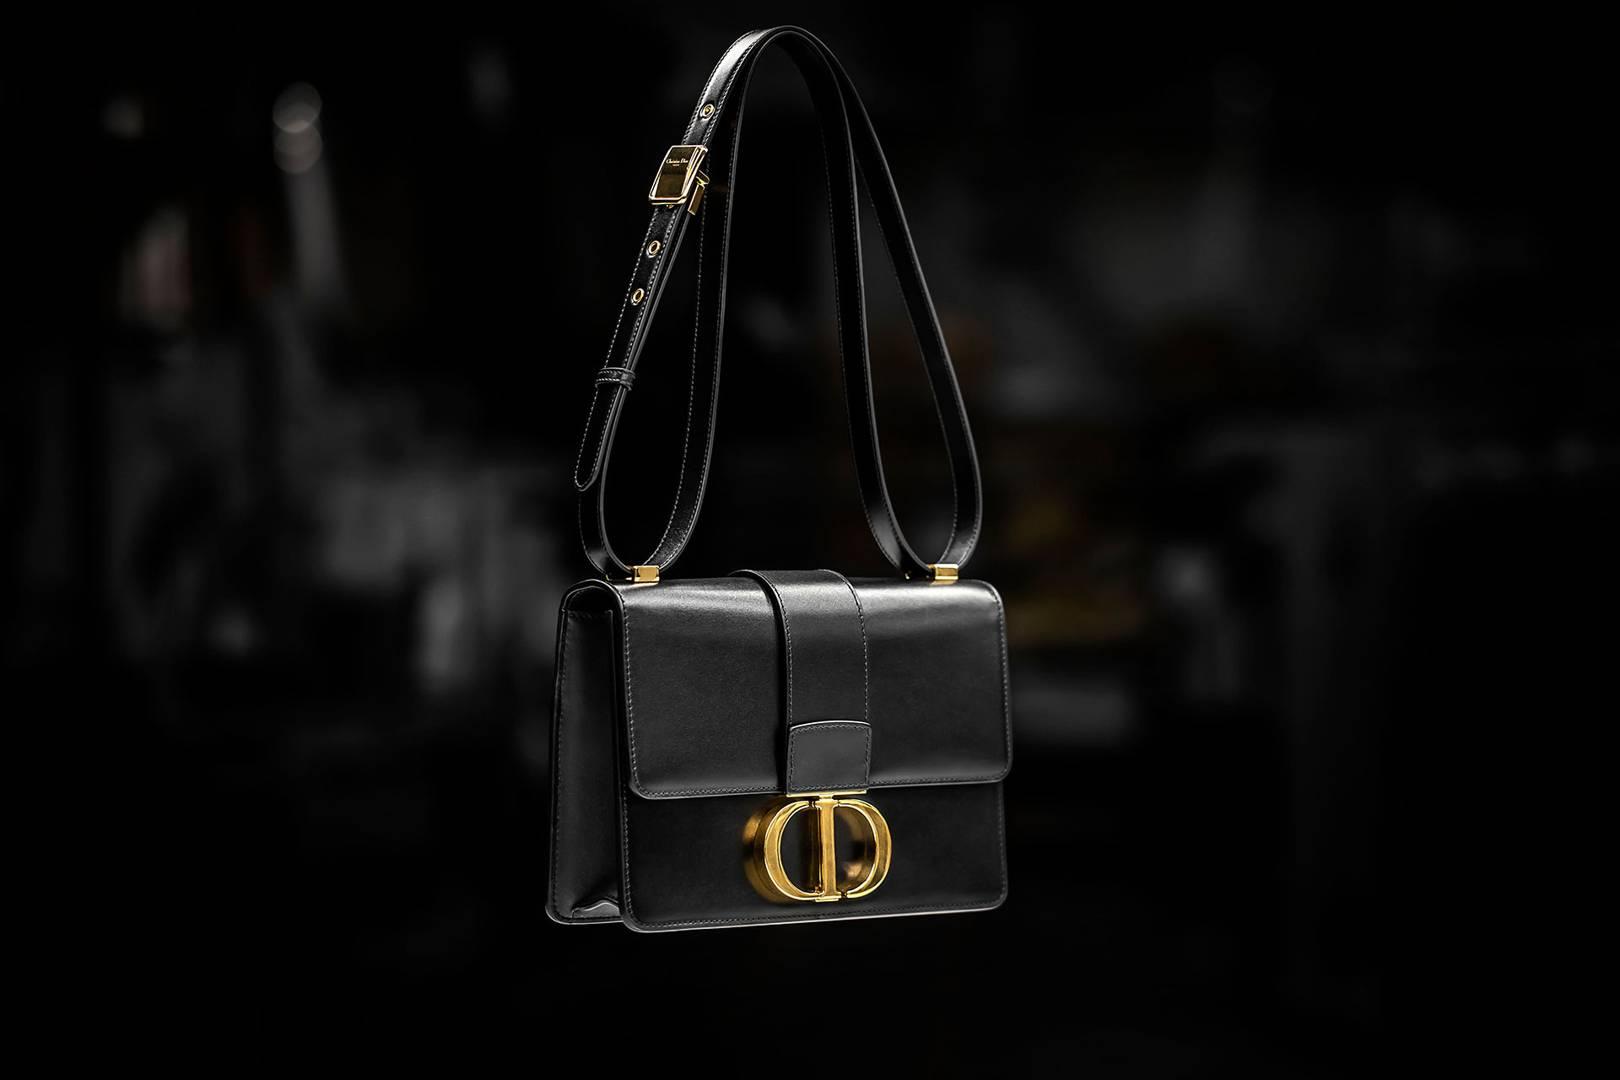 6a2645e63c1 Dior Is Back With A New Bag Set To Be Even More Popular Than The Saddle |  British Vogue